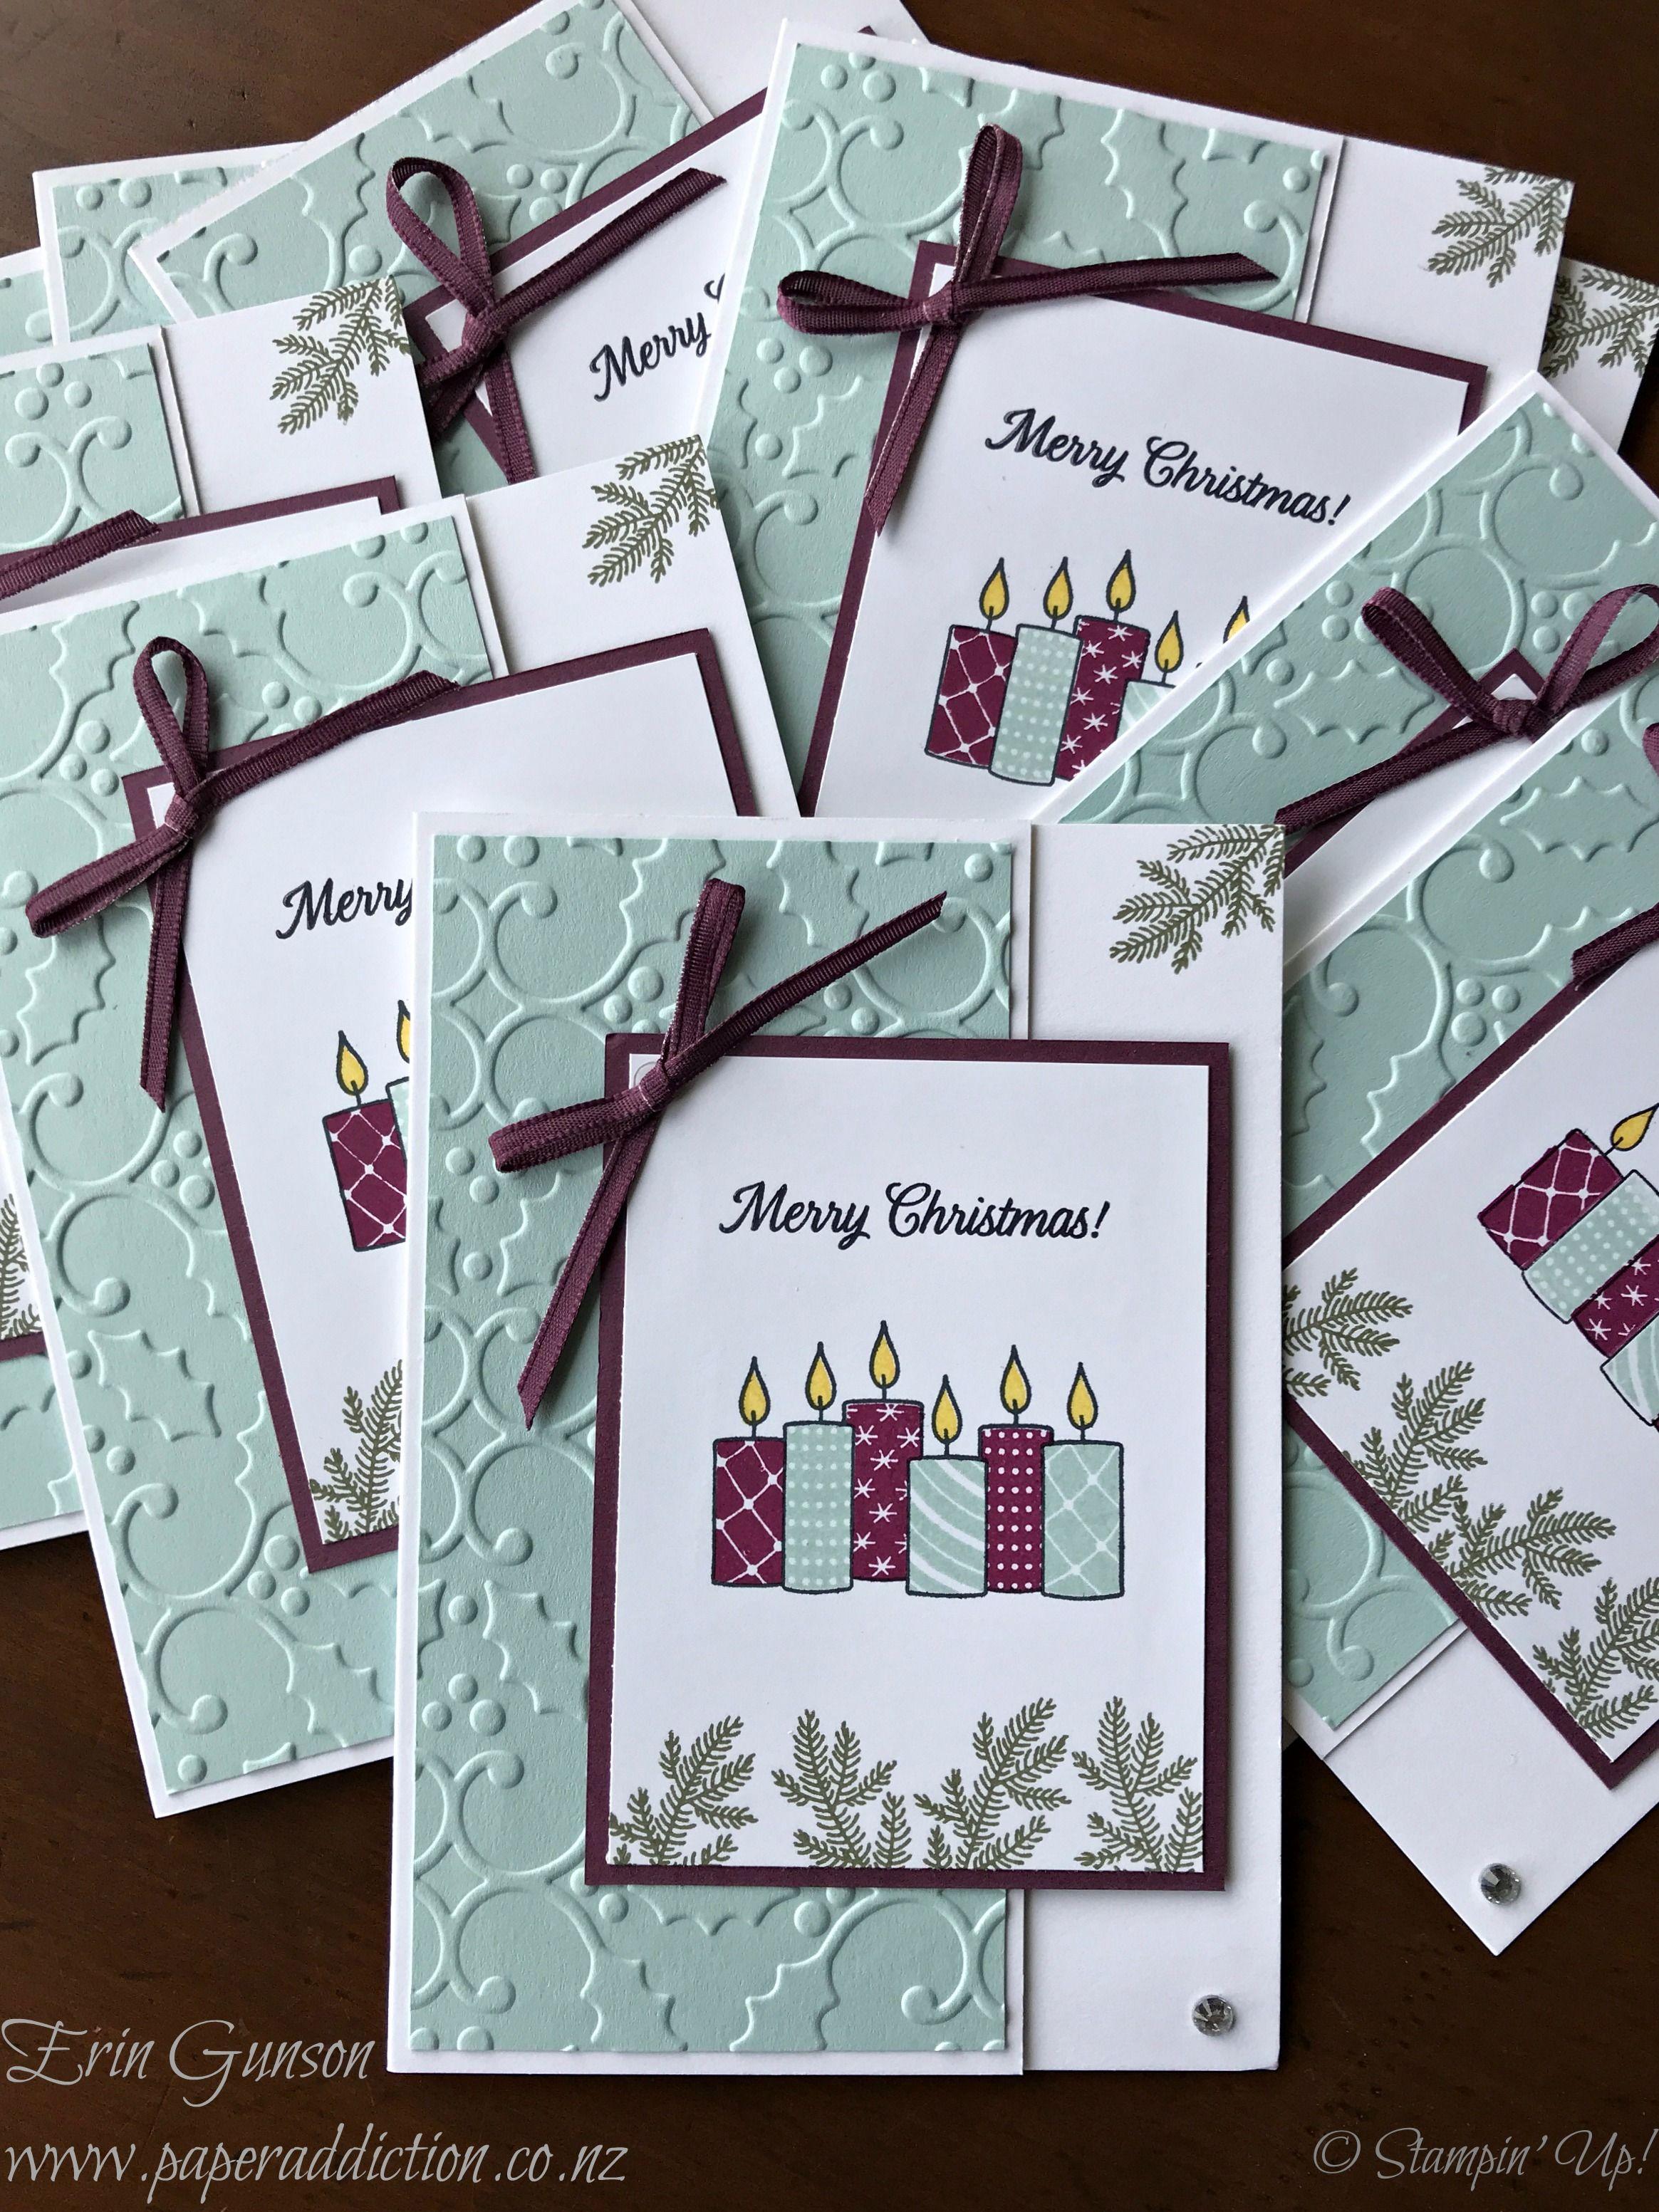 Superior Card Making Ideas Nz Part - 14: Stampin Up Merry Patterns Christmas Card. Erin Gunson Www.paperaddiction.co. Nz